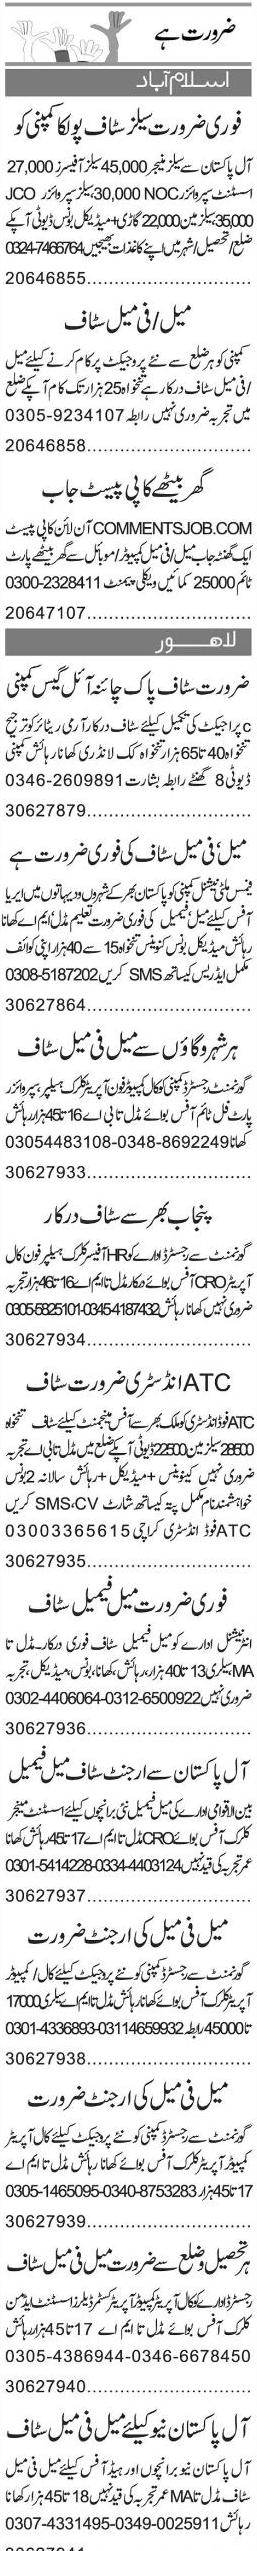 Computer Operators, Telephone Operators, Supervisors Wanted